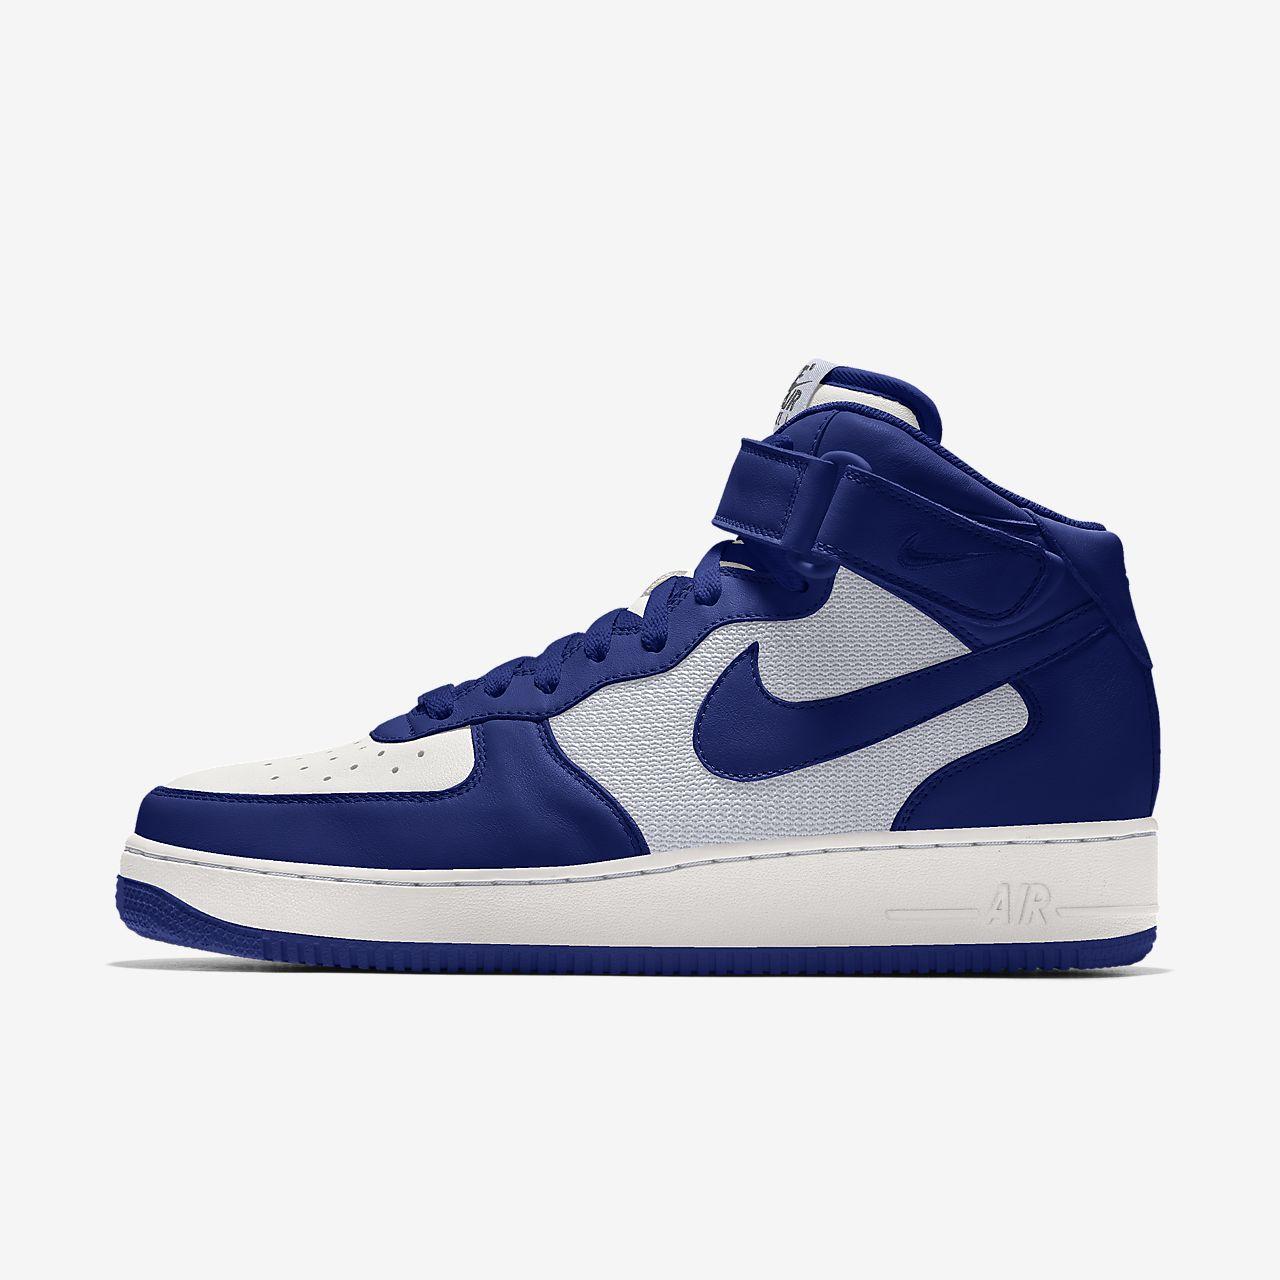 Nike Air Force 1 Mid By You Custom Older Kids' Shoe